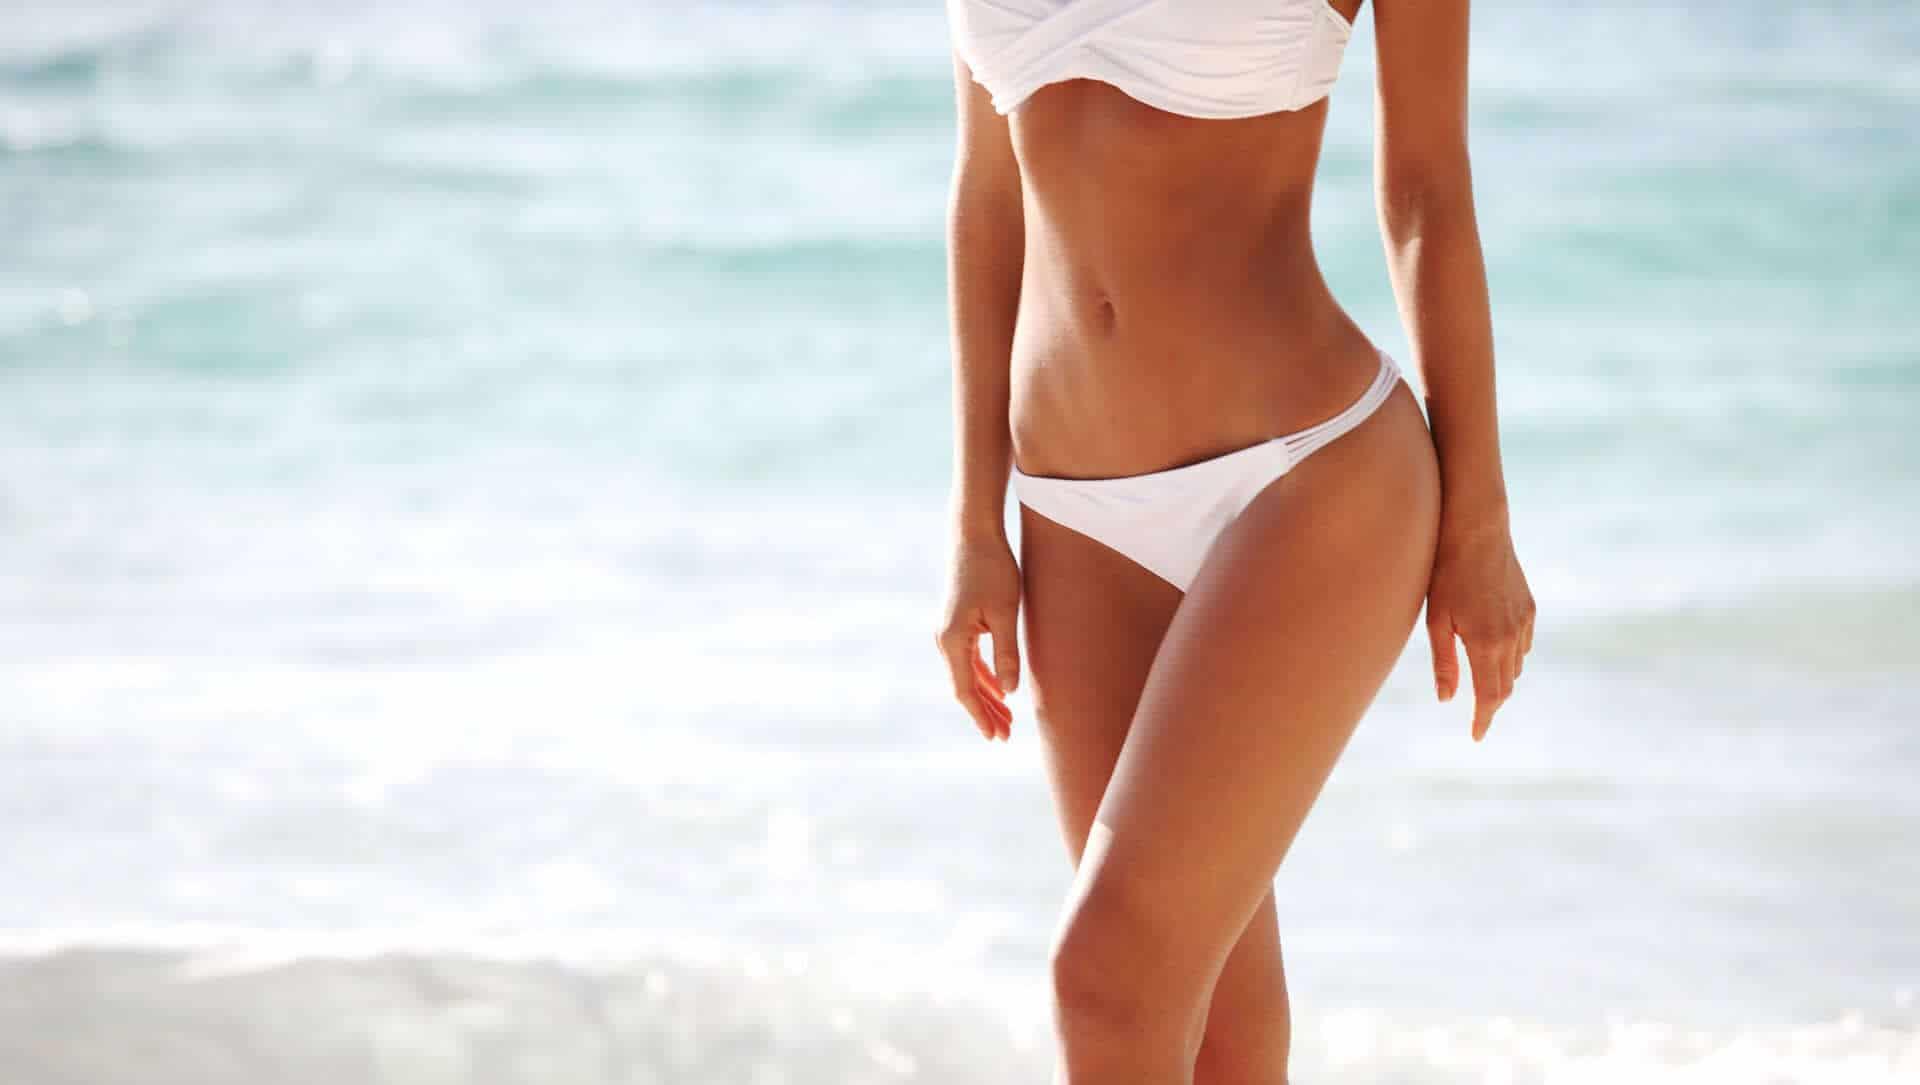 San Diego & Temecula Plastic & Cosmetic Surgery | Coastal